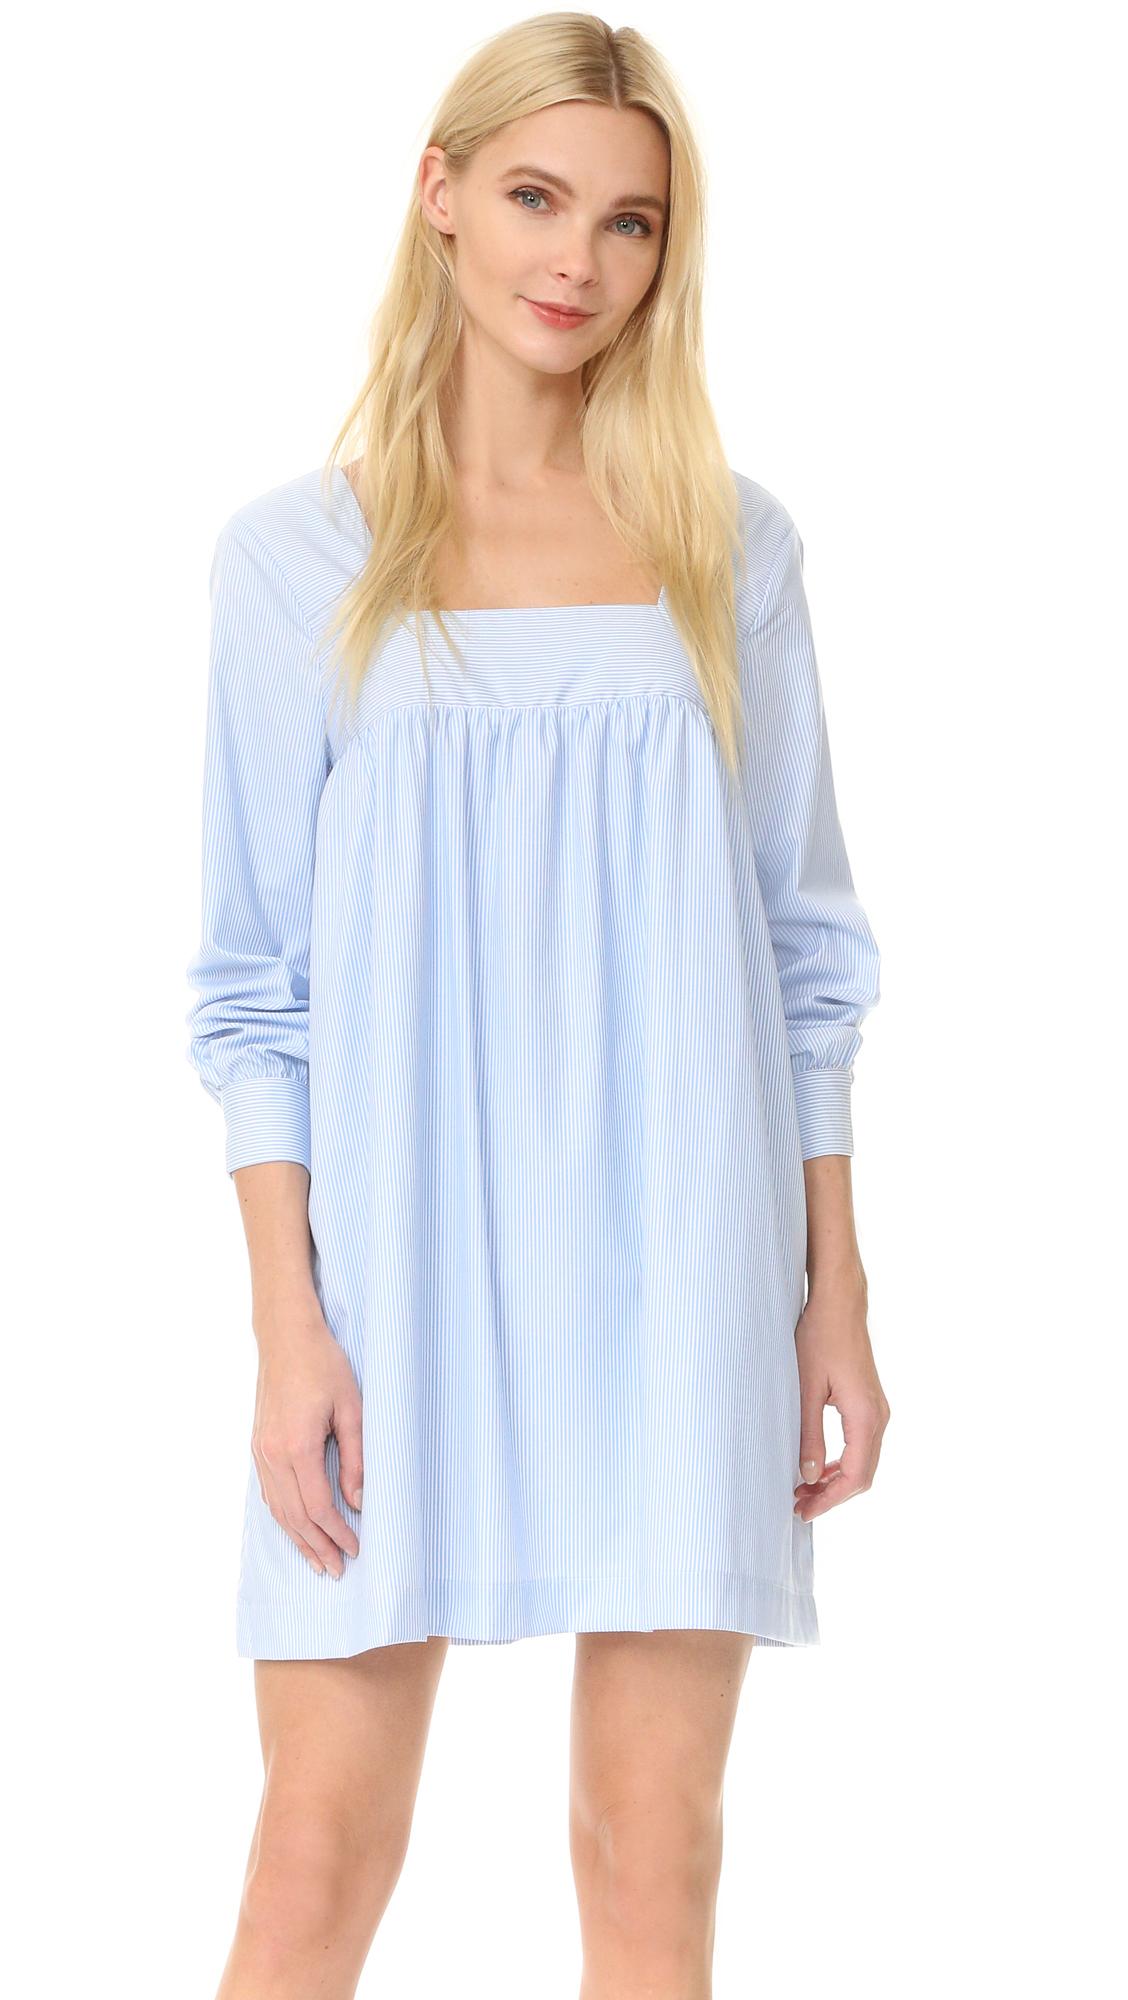 After Market Tie Dress - Blue Combo at Shopbop